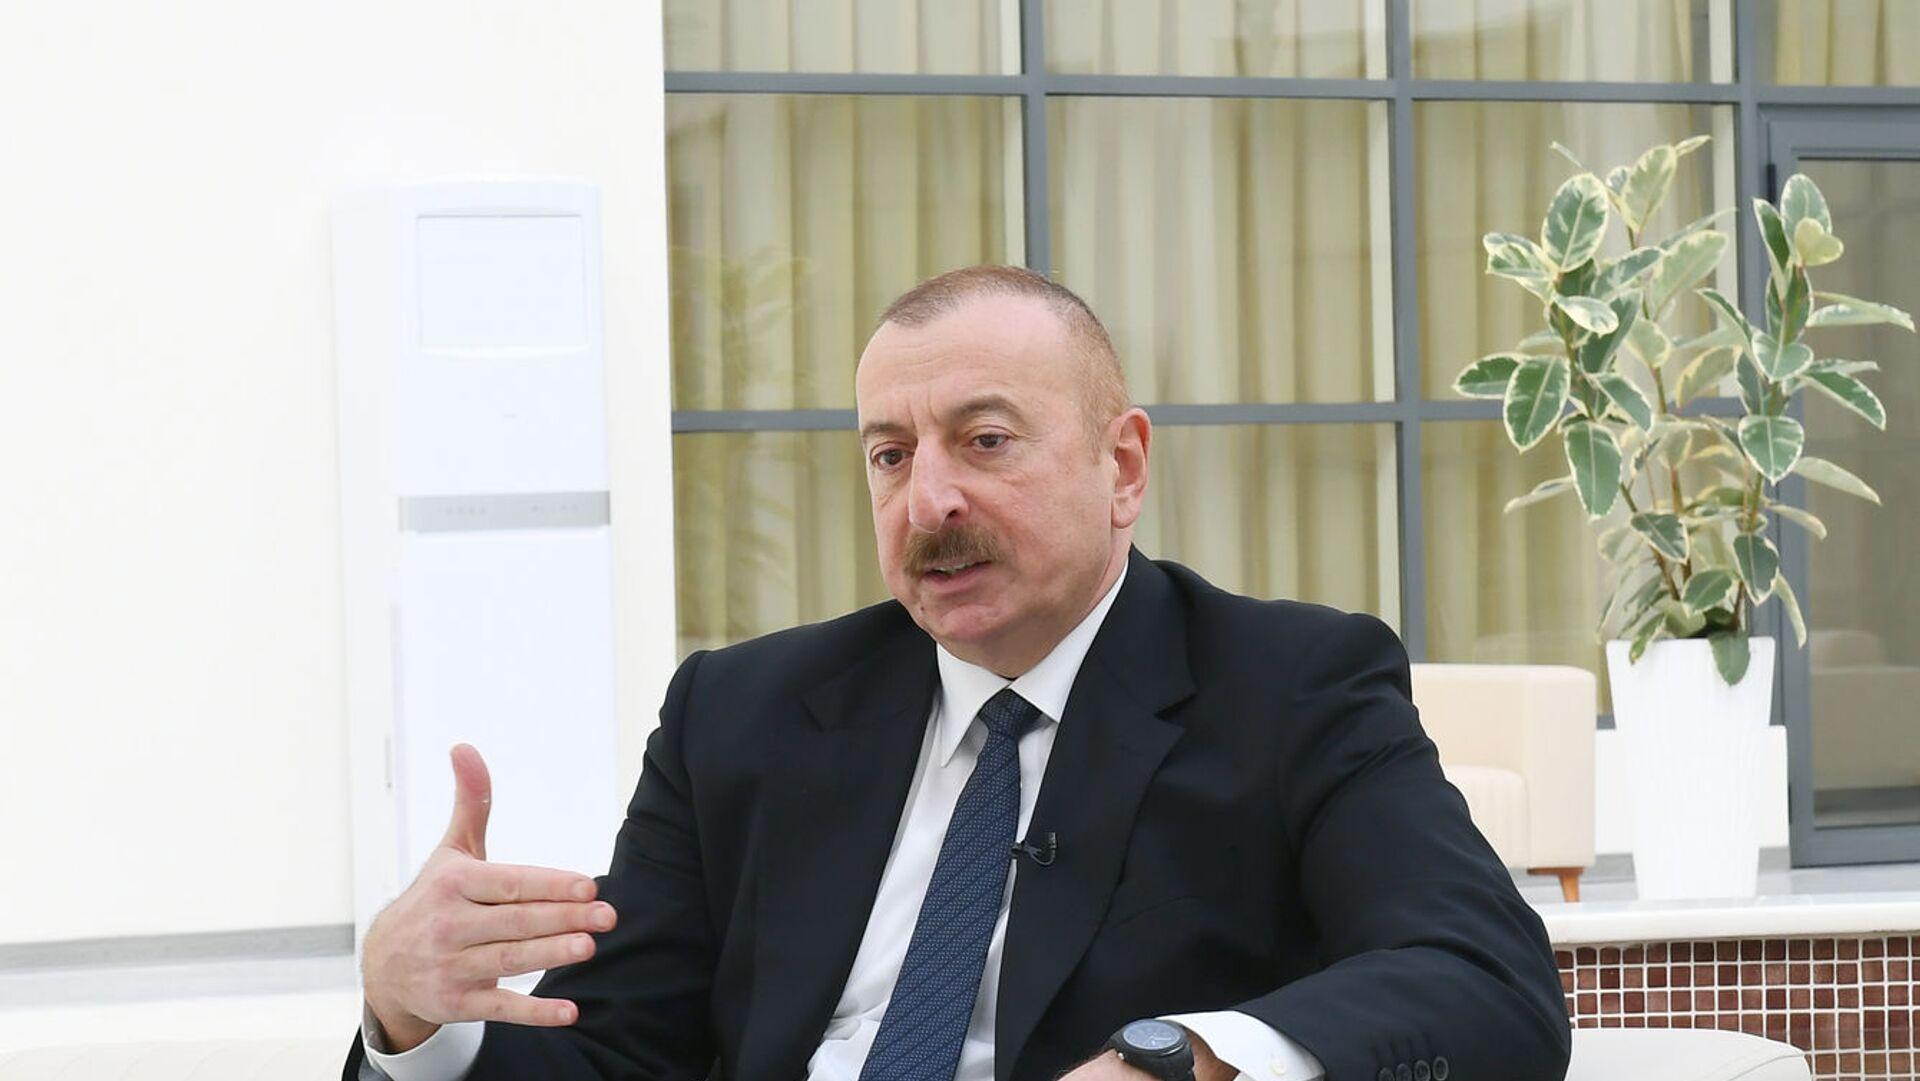 Президент Ильхам Алиев, фото из архива - Sputnik Азербайджан, 1920, 26.02.2021